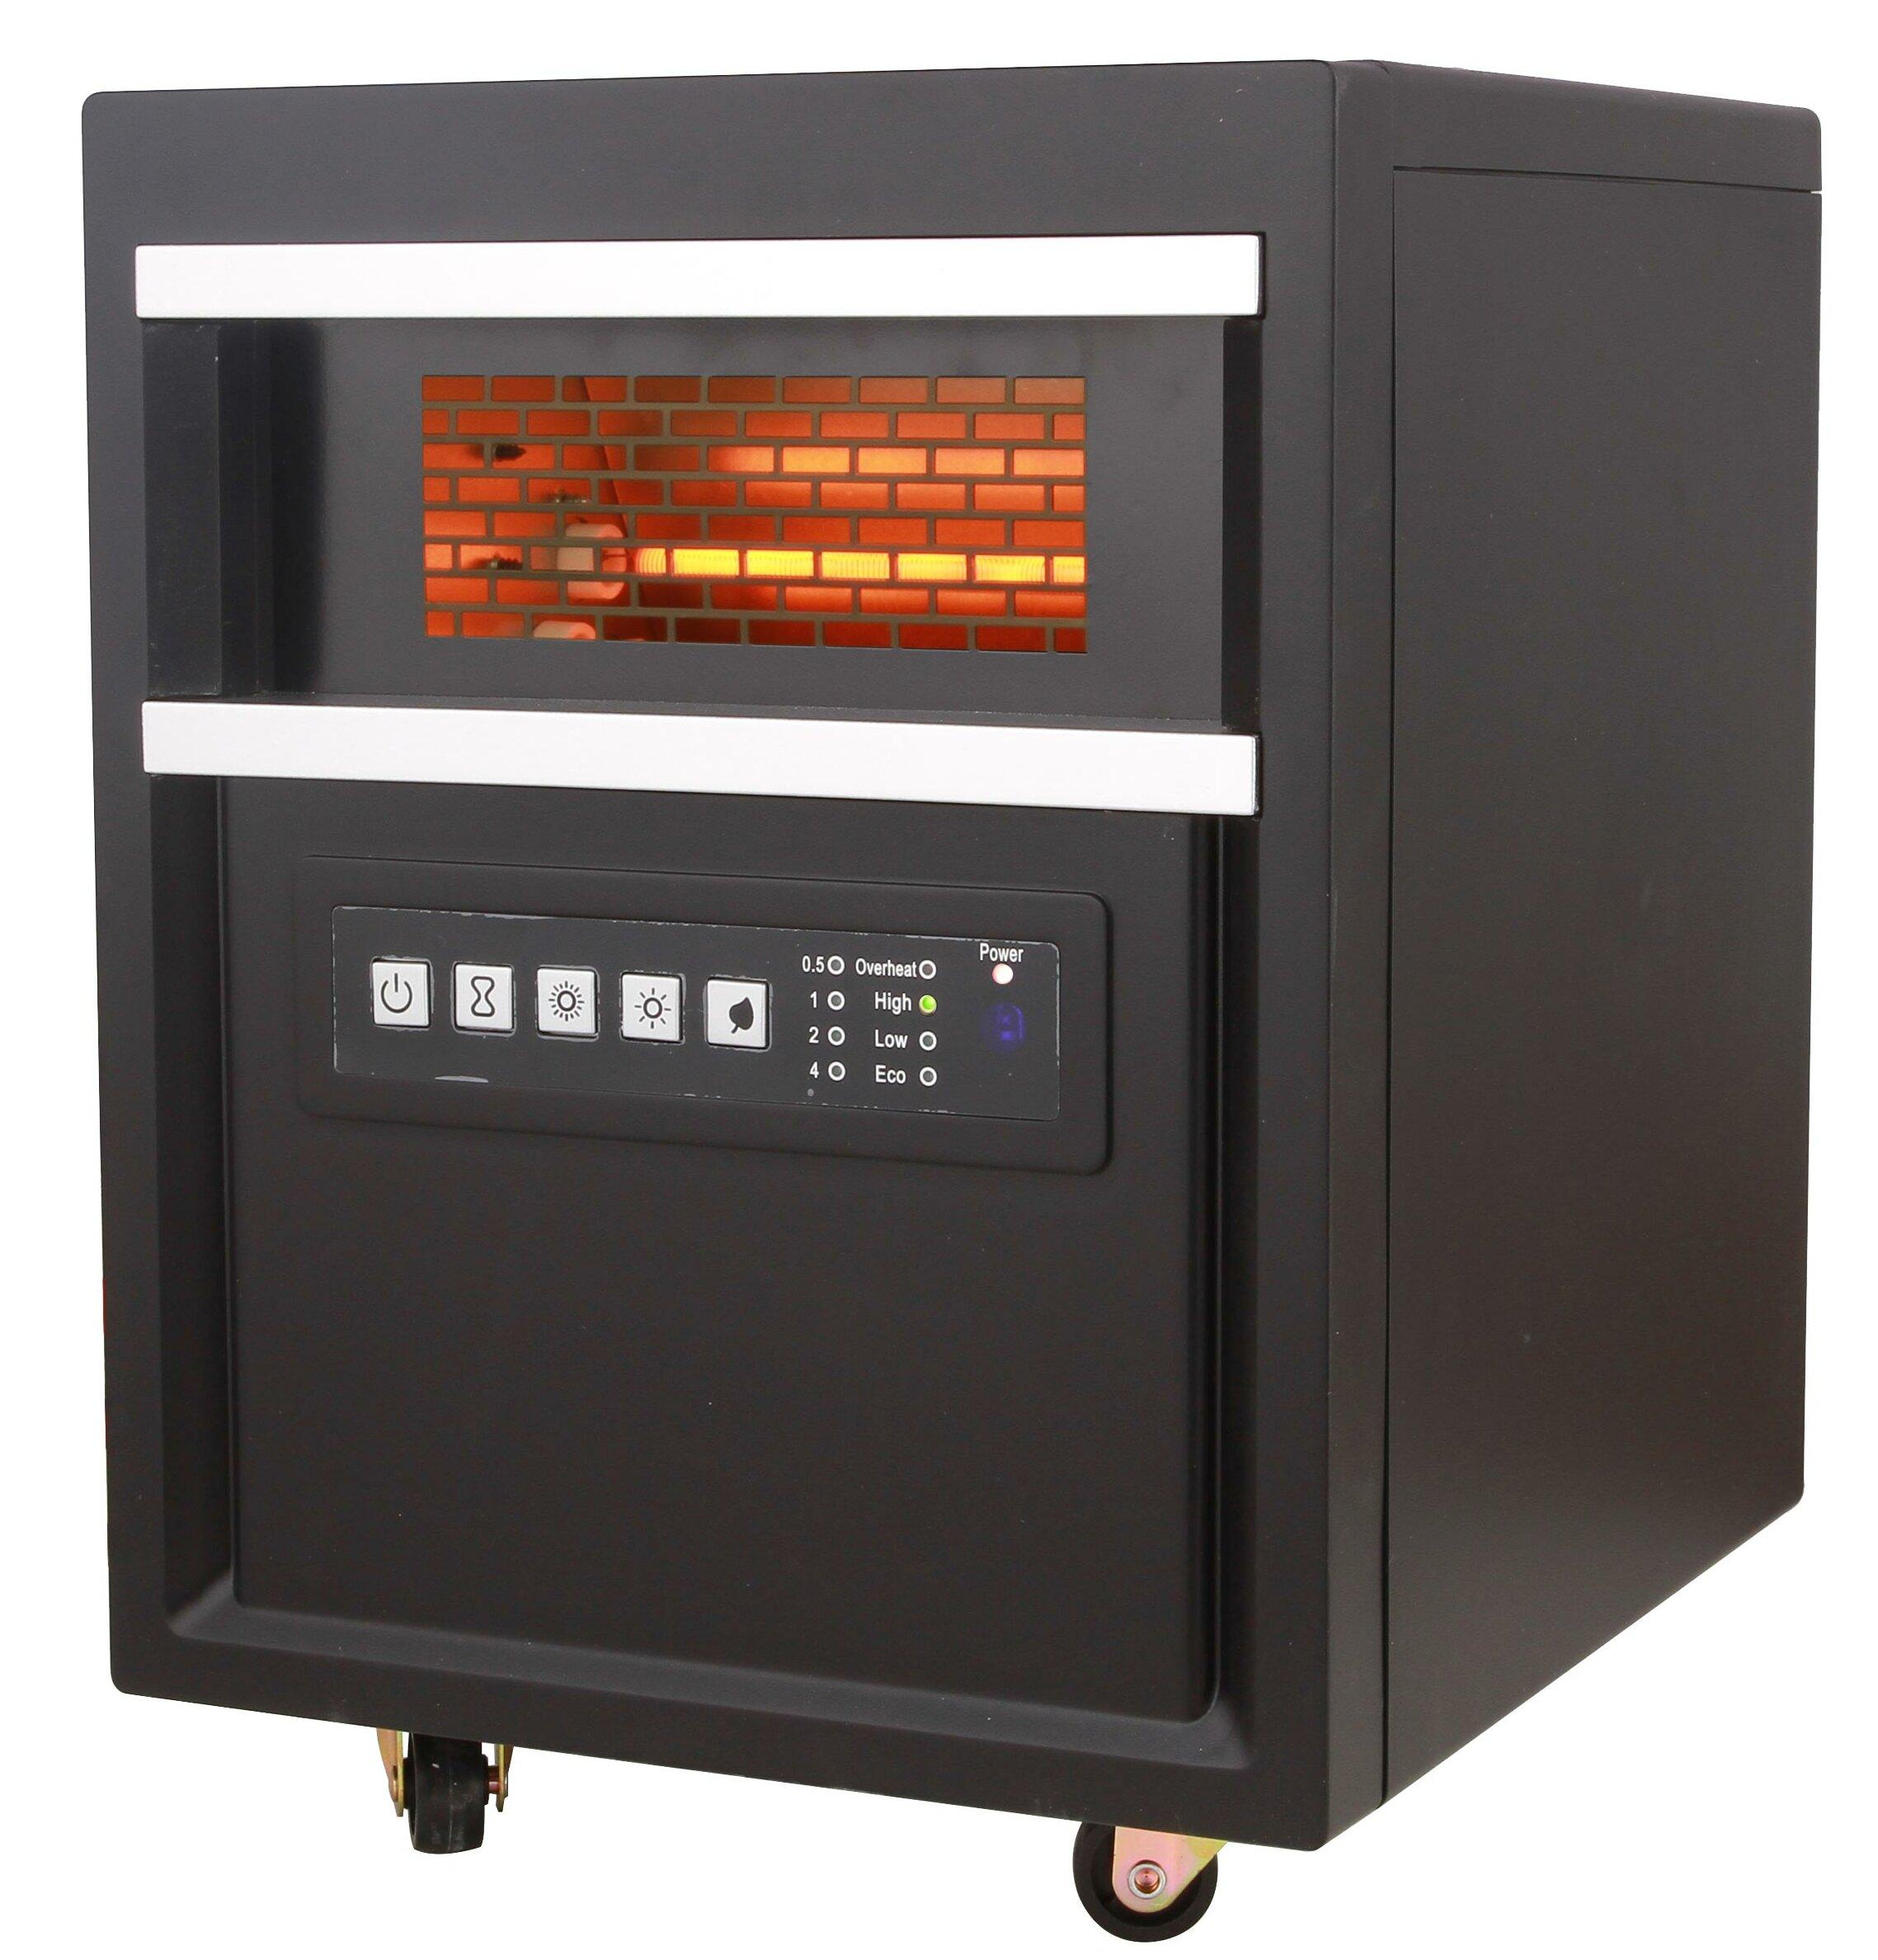 Gentil All Pro Comfort Glow Infrared 5100 BTU Electric Cabinet Heater | Wayfair